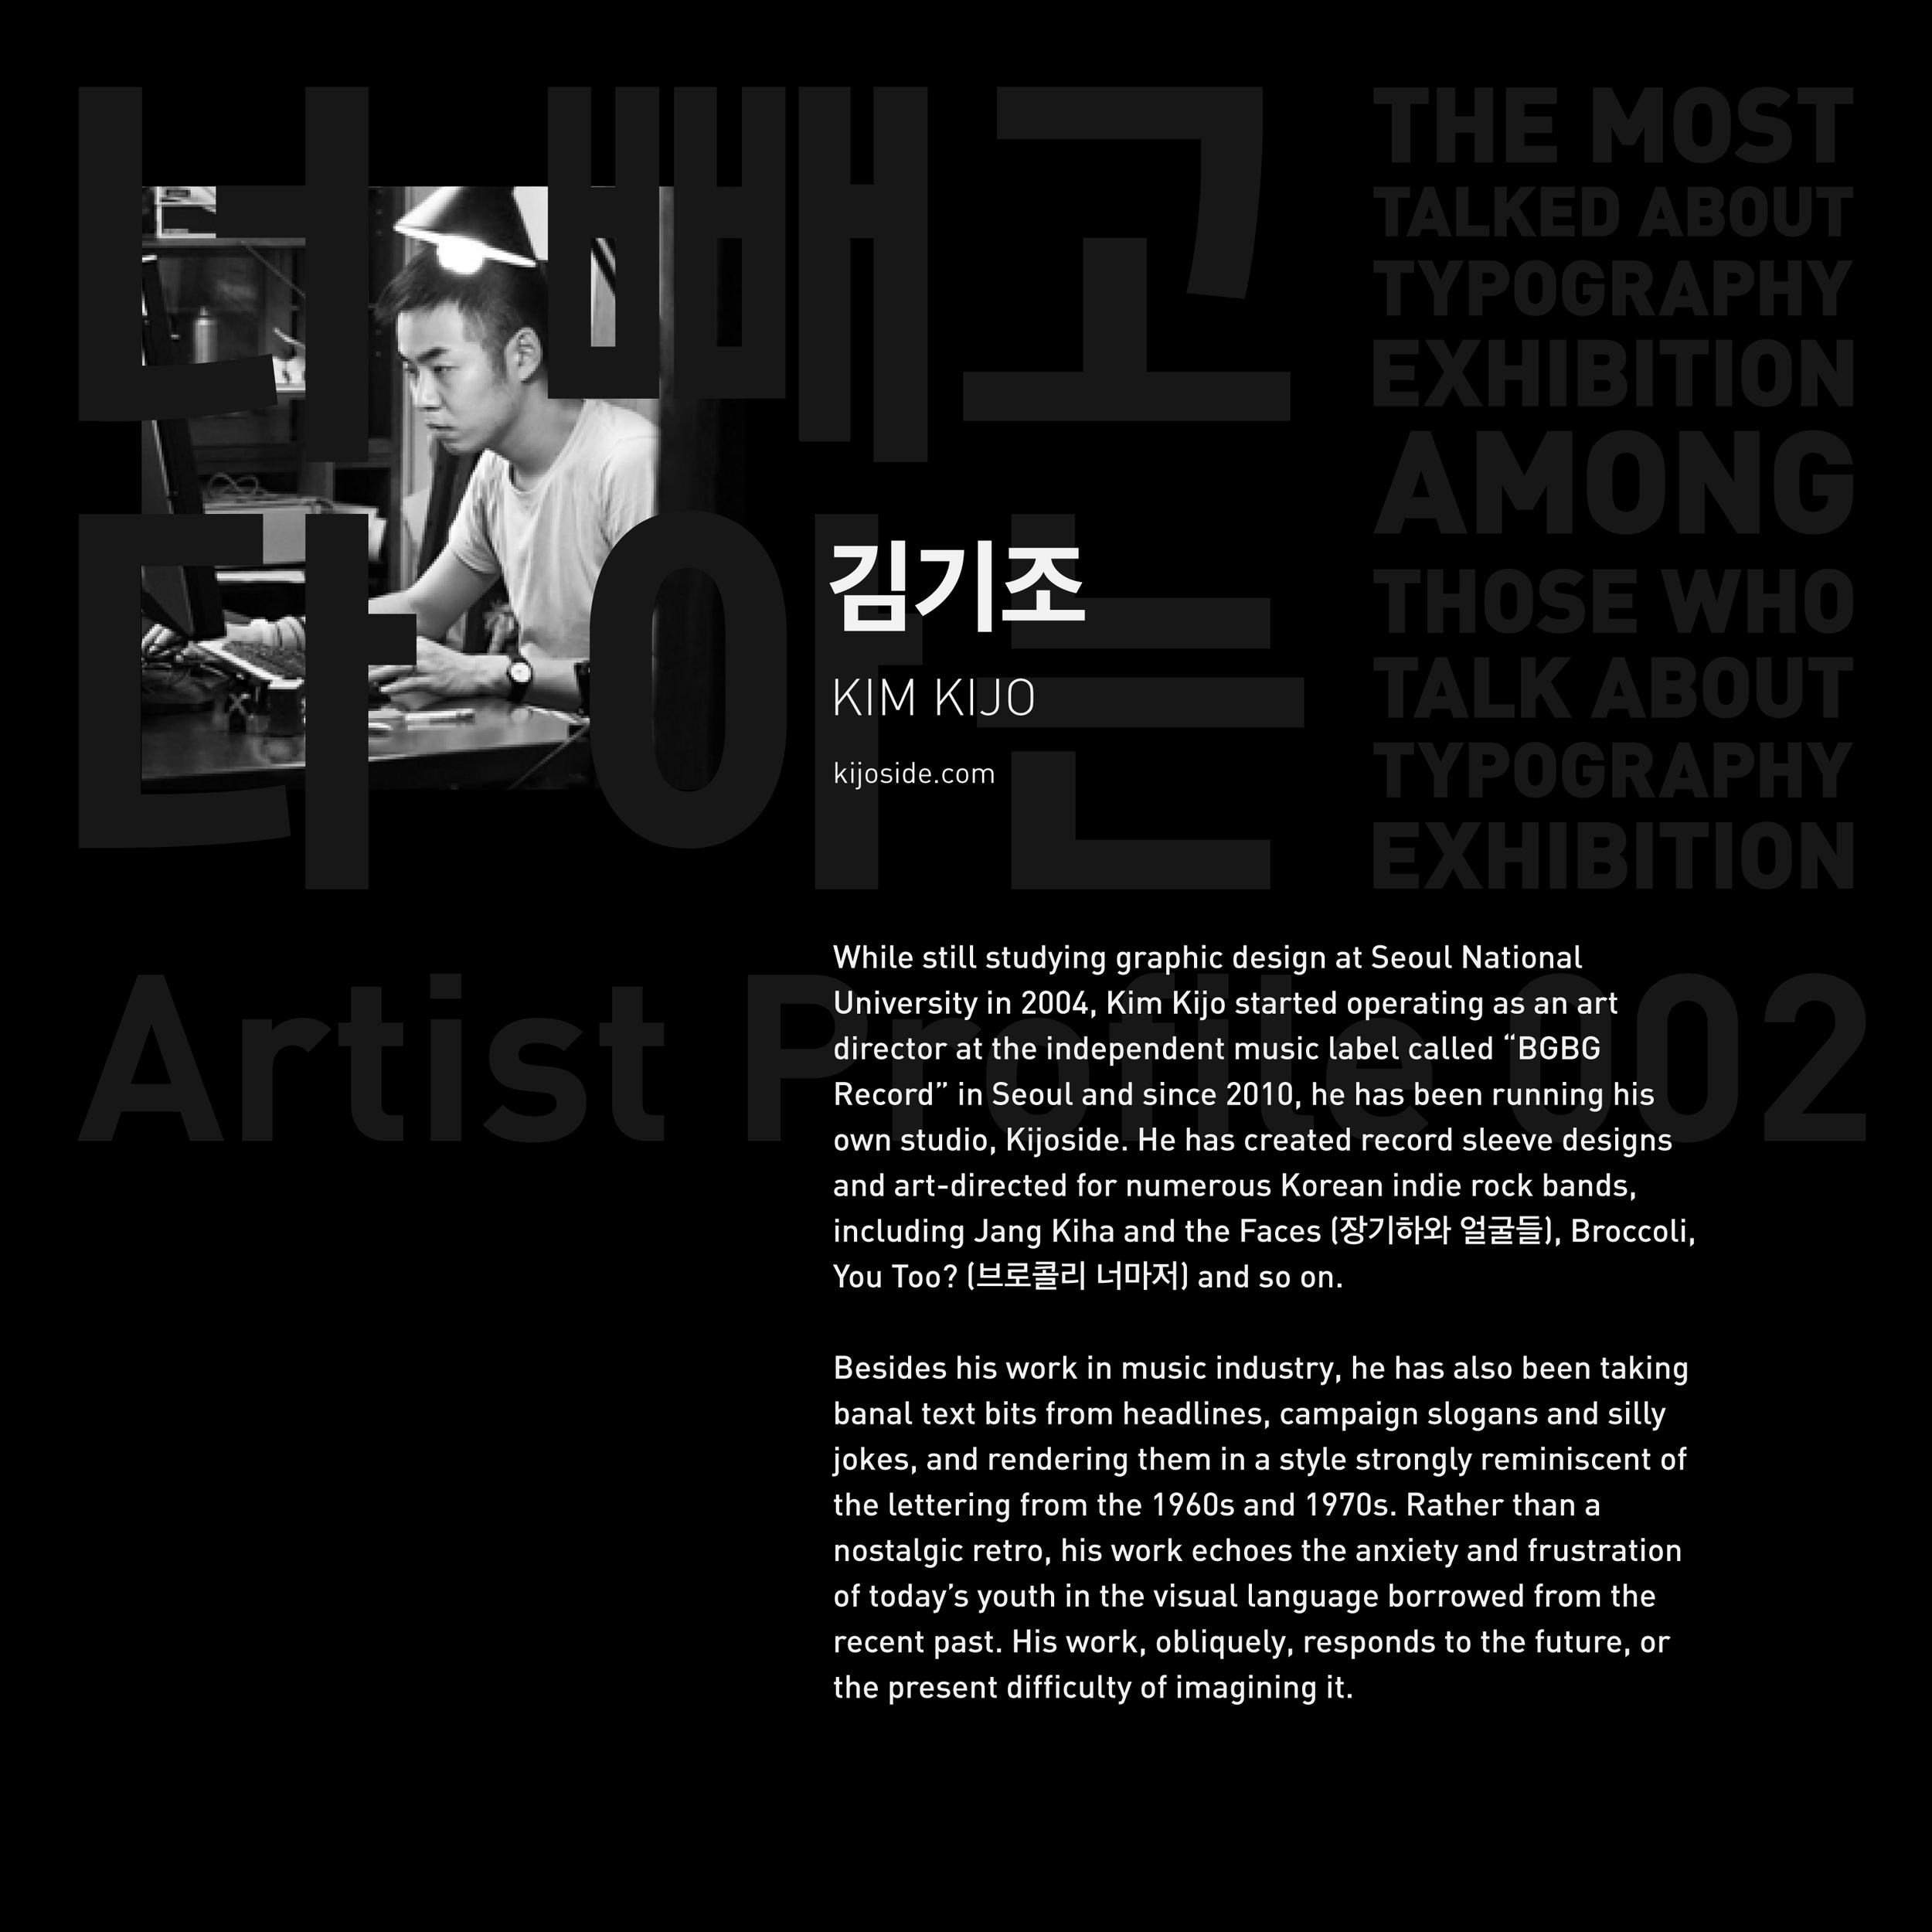 KoreanTypeExhibit_ArtistProfile_V2-02.png